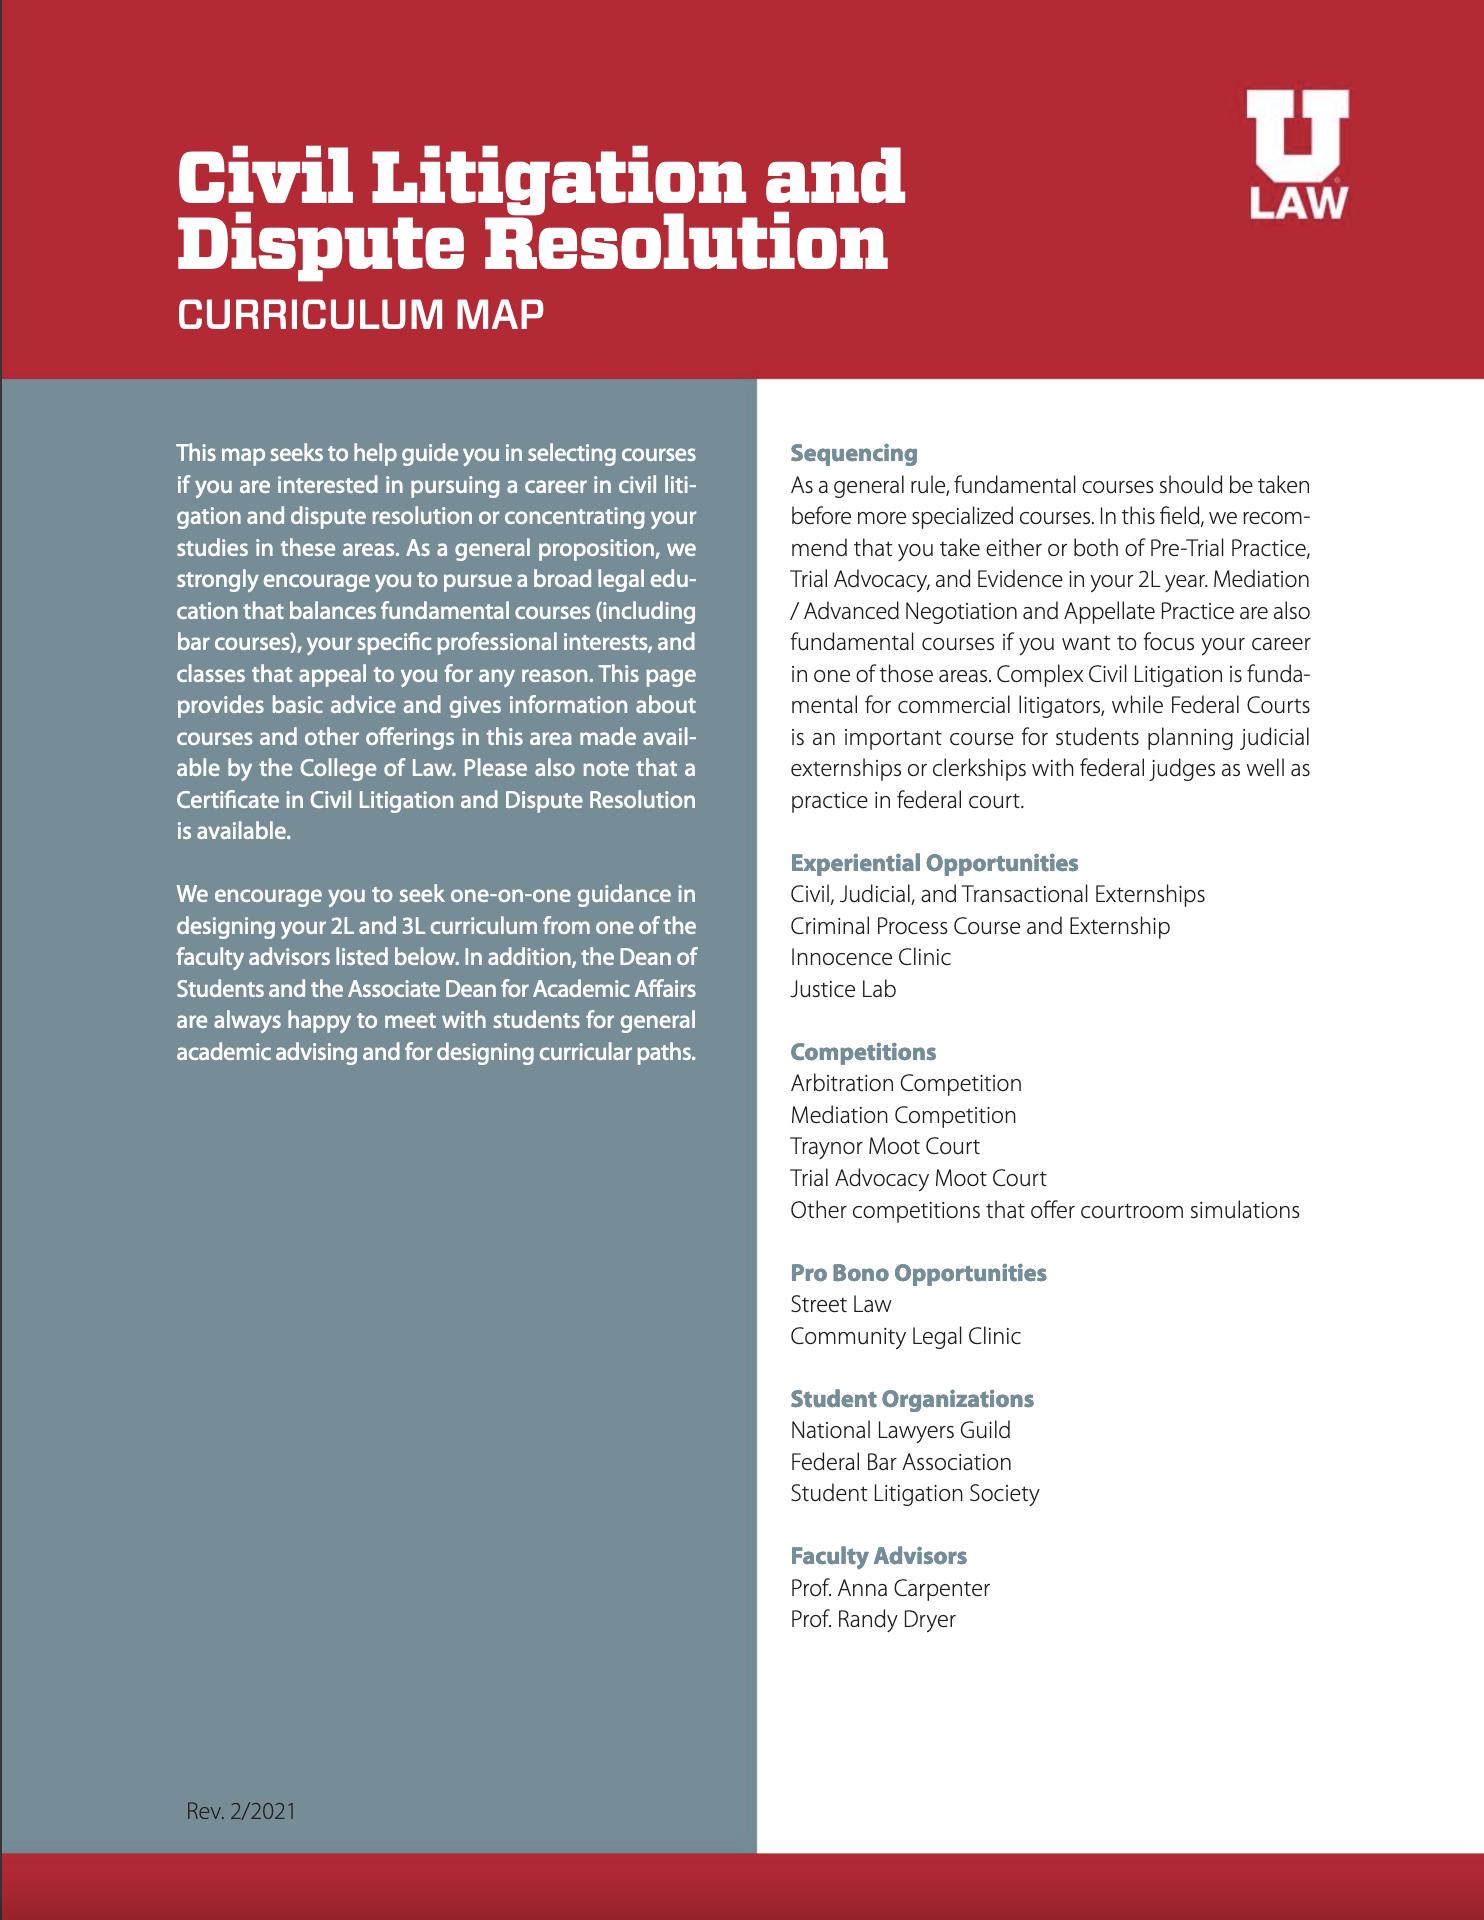 Civil Litigation and Dispute Resolution Curriculum Map